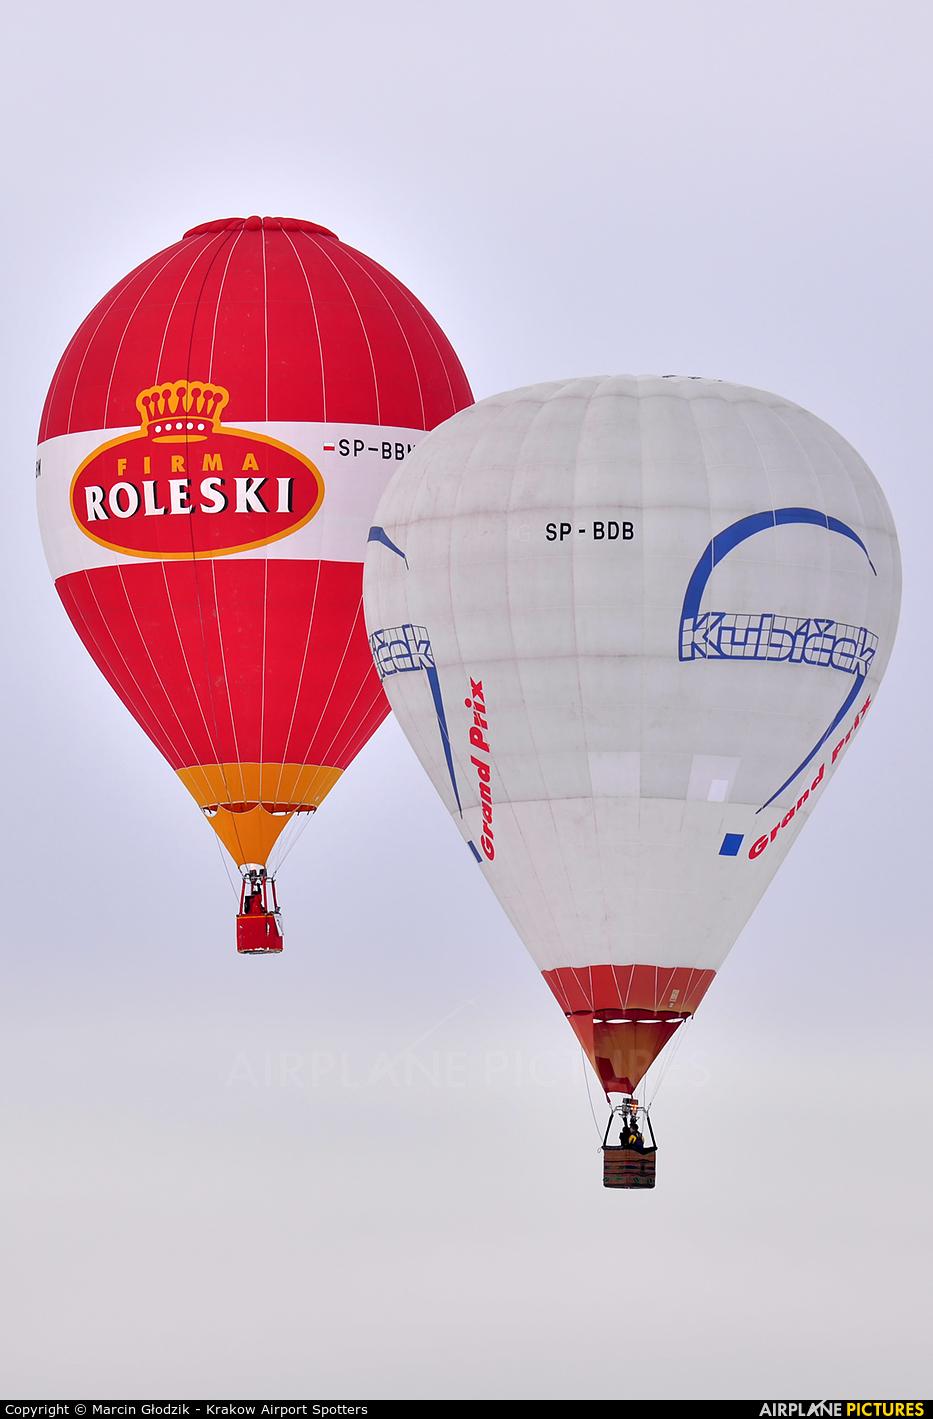 Aeroklub Krakowski SP-BDB aircraft at Nowy Targ Airport